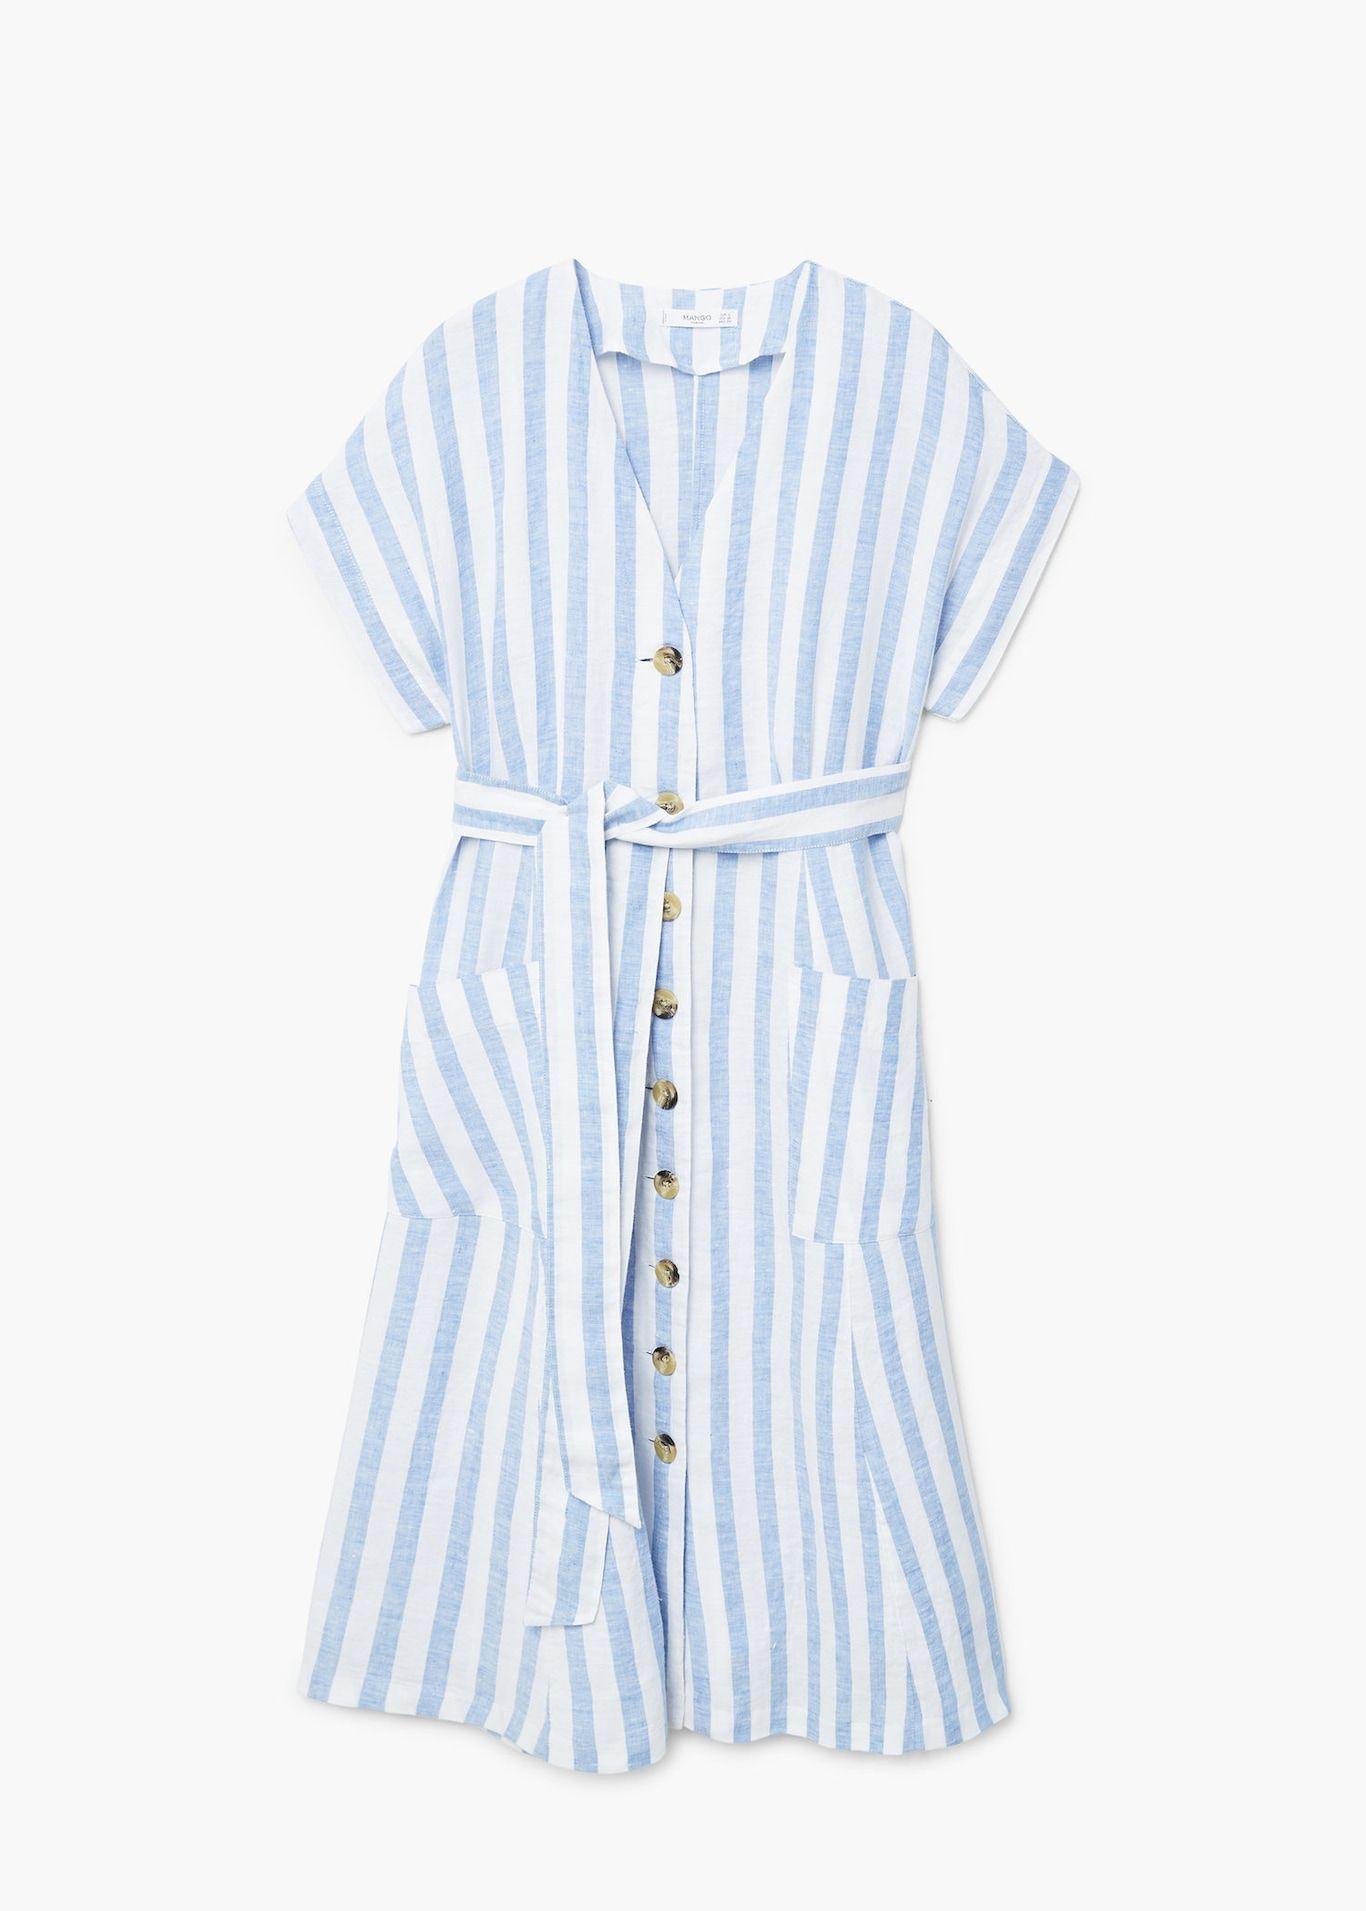 28ccc8277fd0 Vestido lino rayas - Vestidos de Mujer | Vestidos/dress | Kläder ...